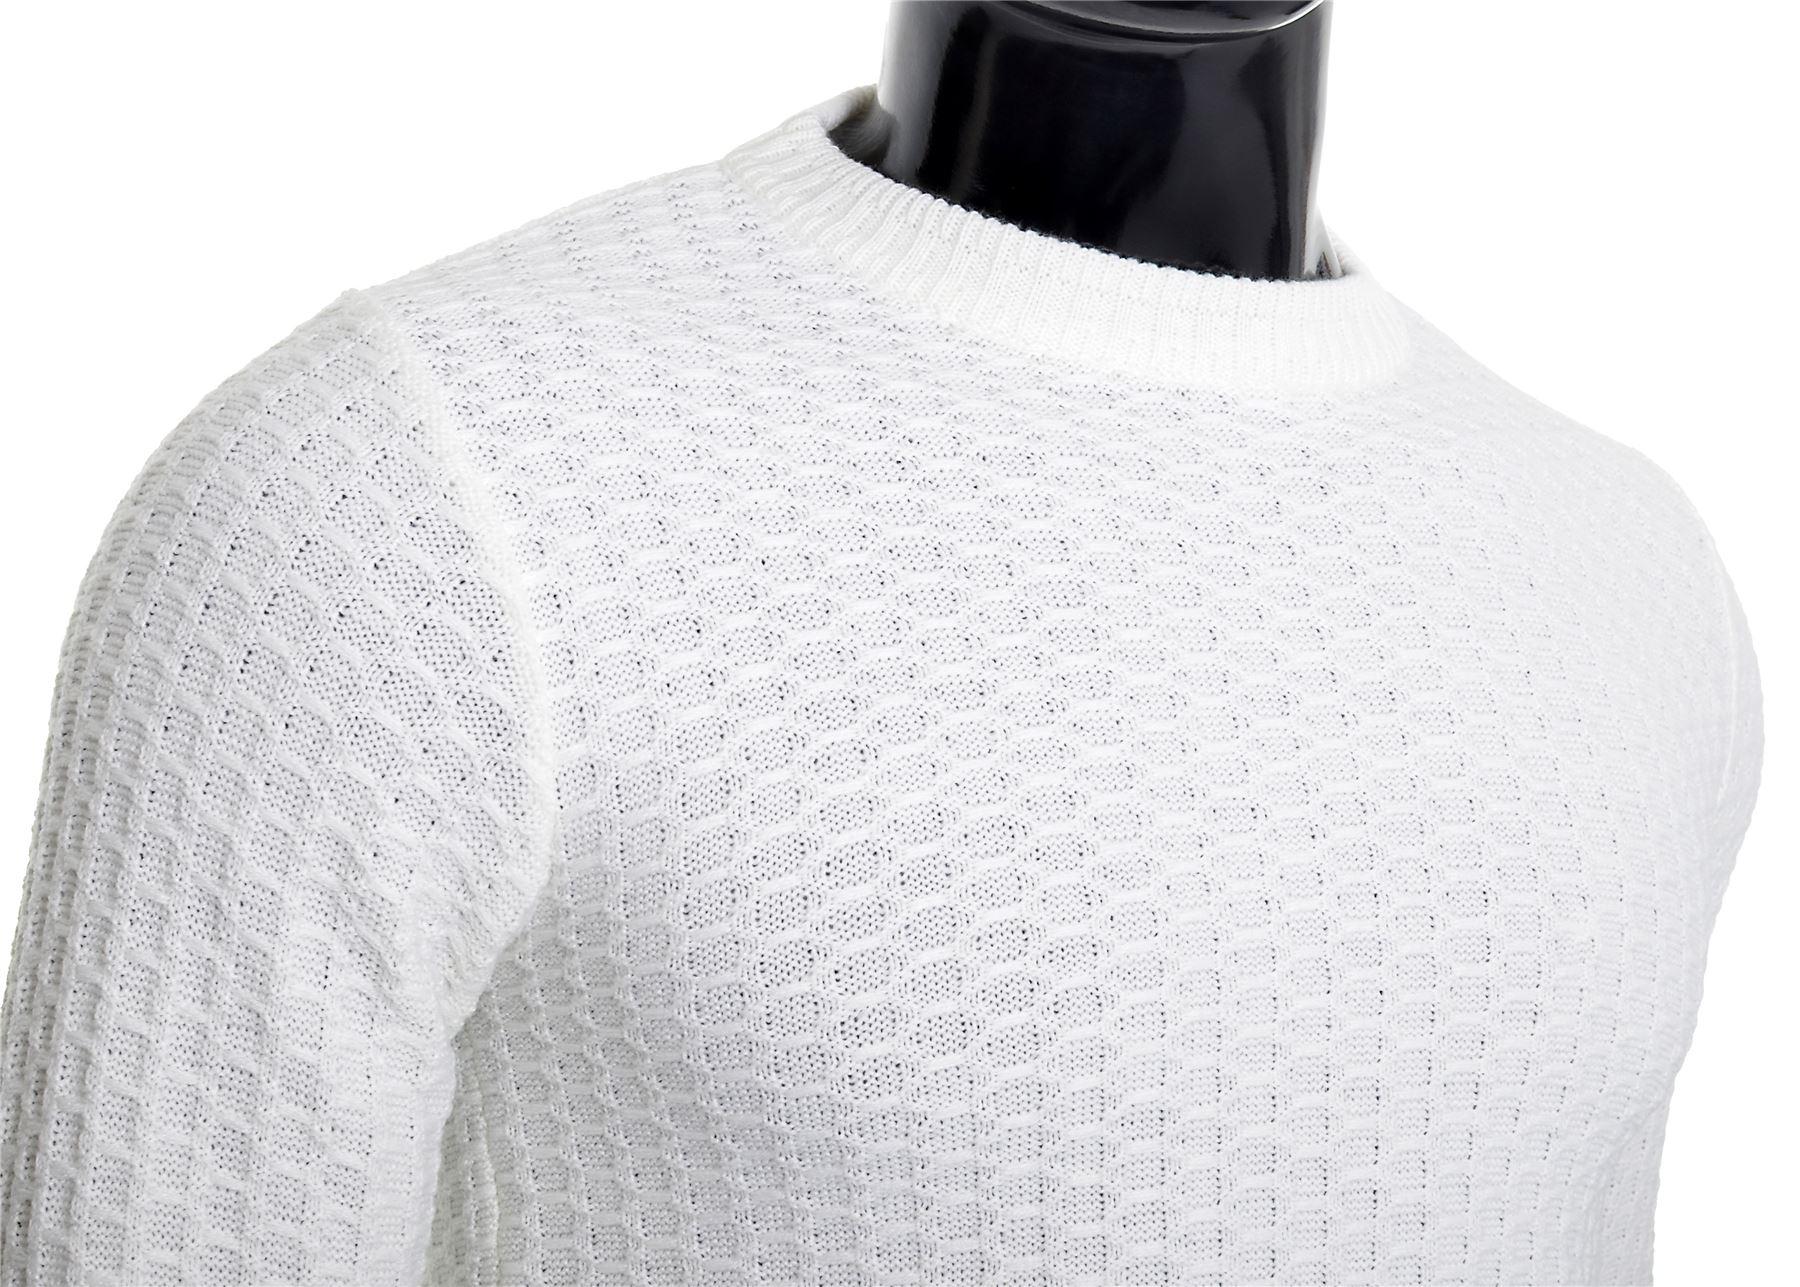 D-amp-R-Men-039-s-Wool-Knit-Jumper-Smart-Long-Sleeve-Sweater-Crew-Neck-Top thumbnail 10